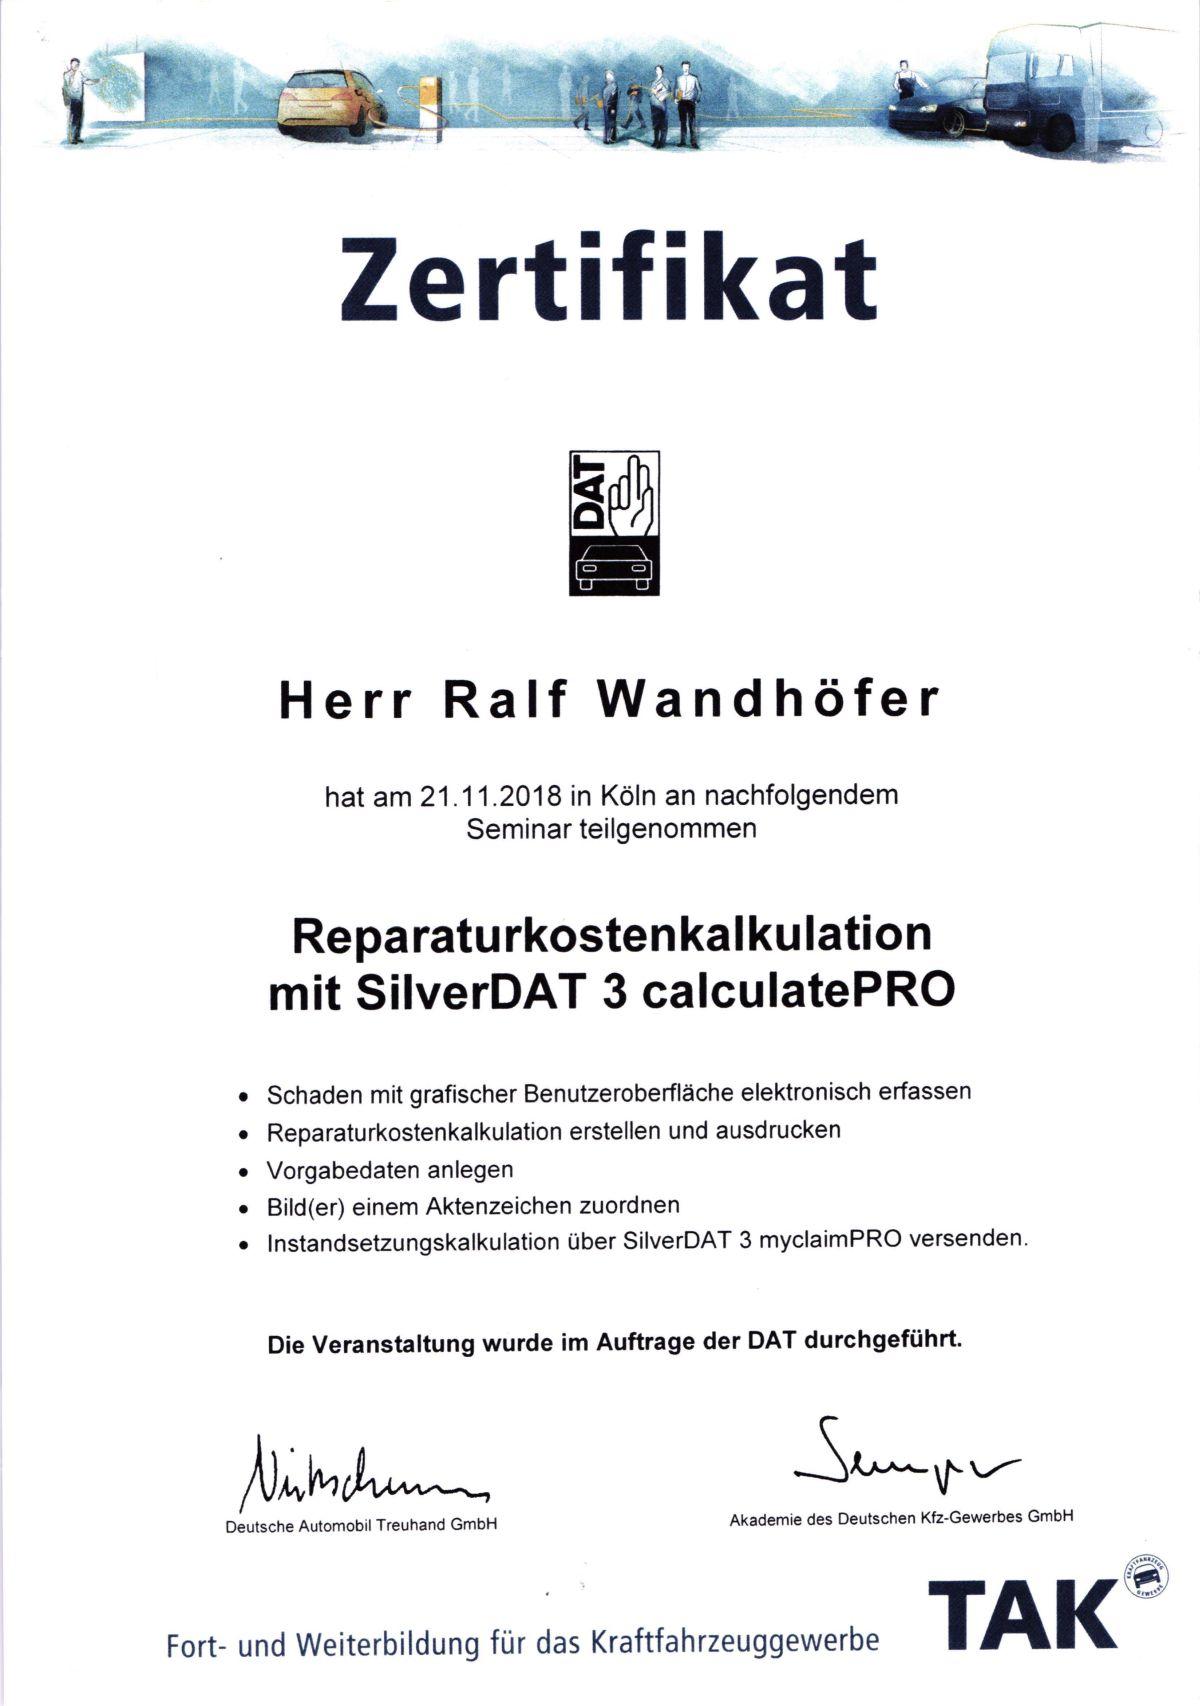 Ralf_Wandhöfer_Zertifikat_015